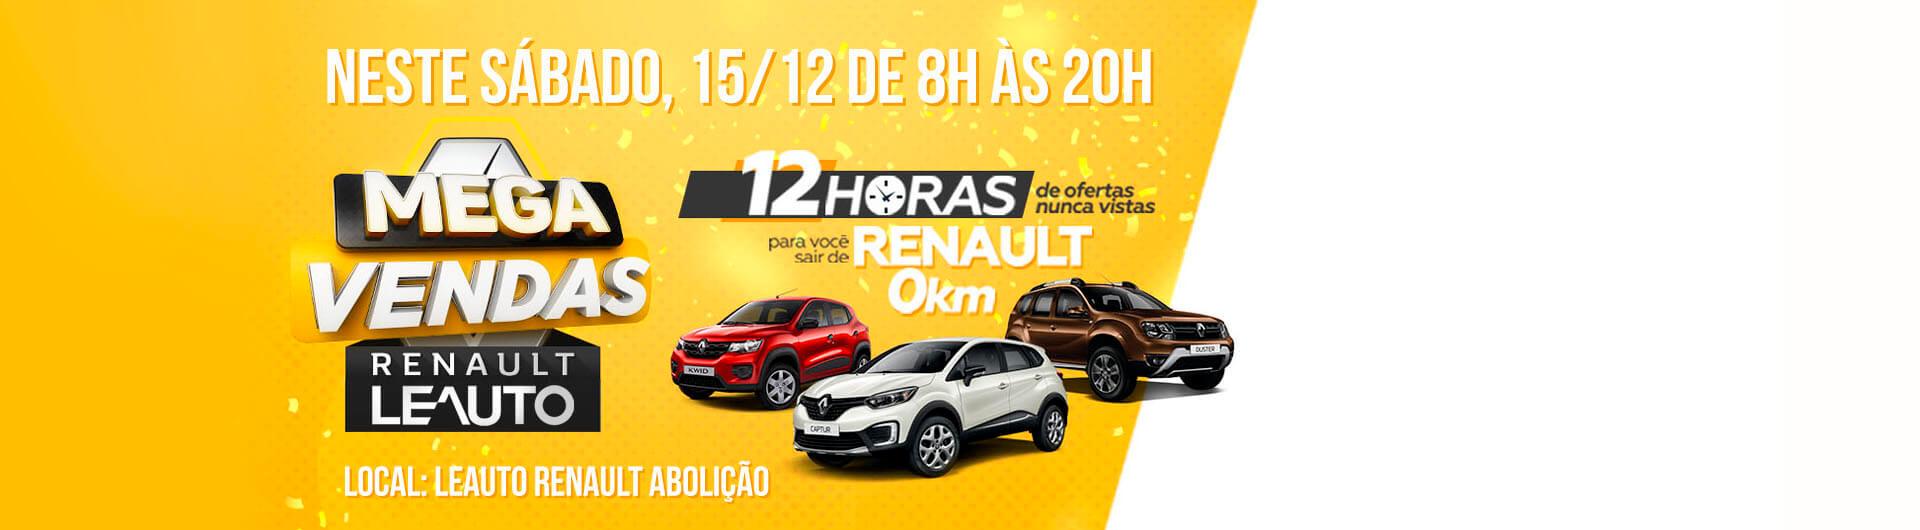 Mega Vendas Leauto Renault